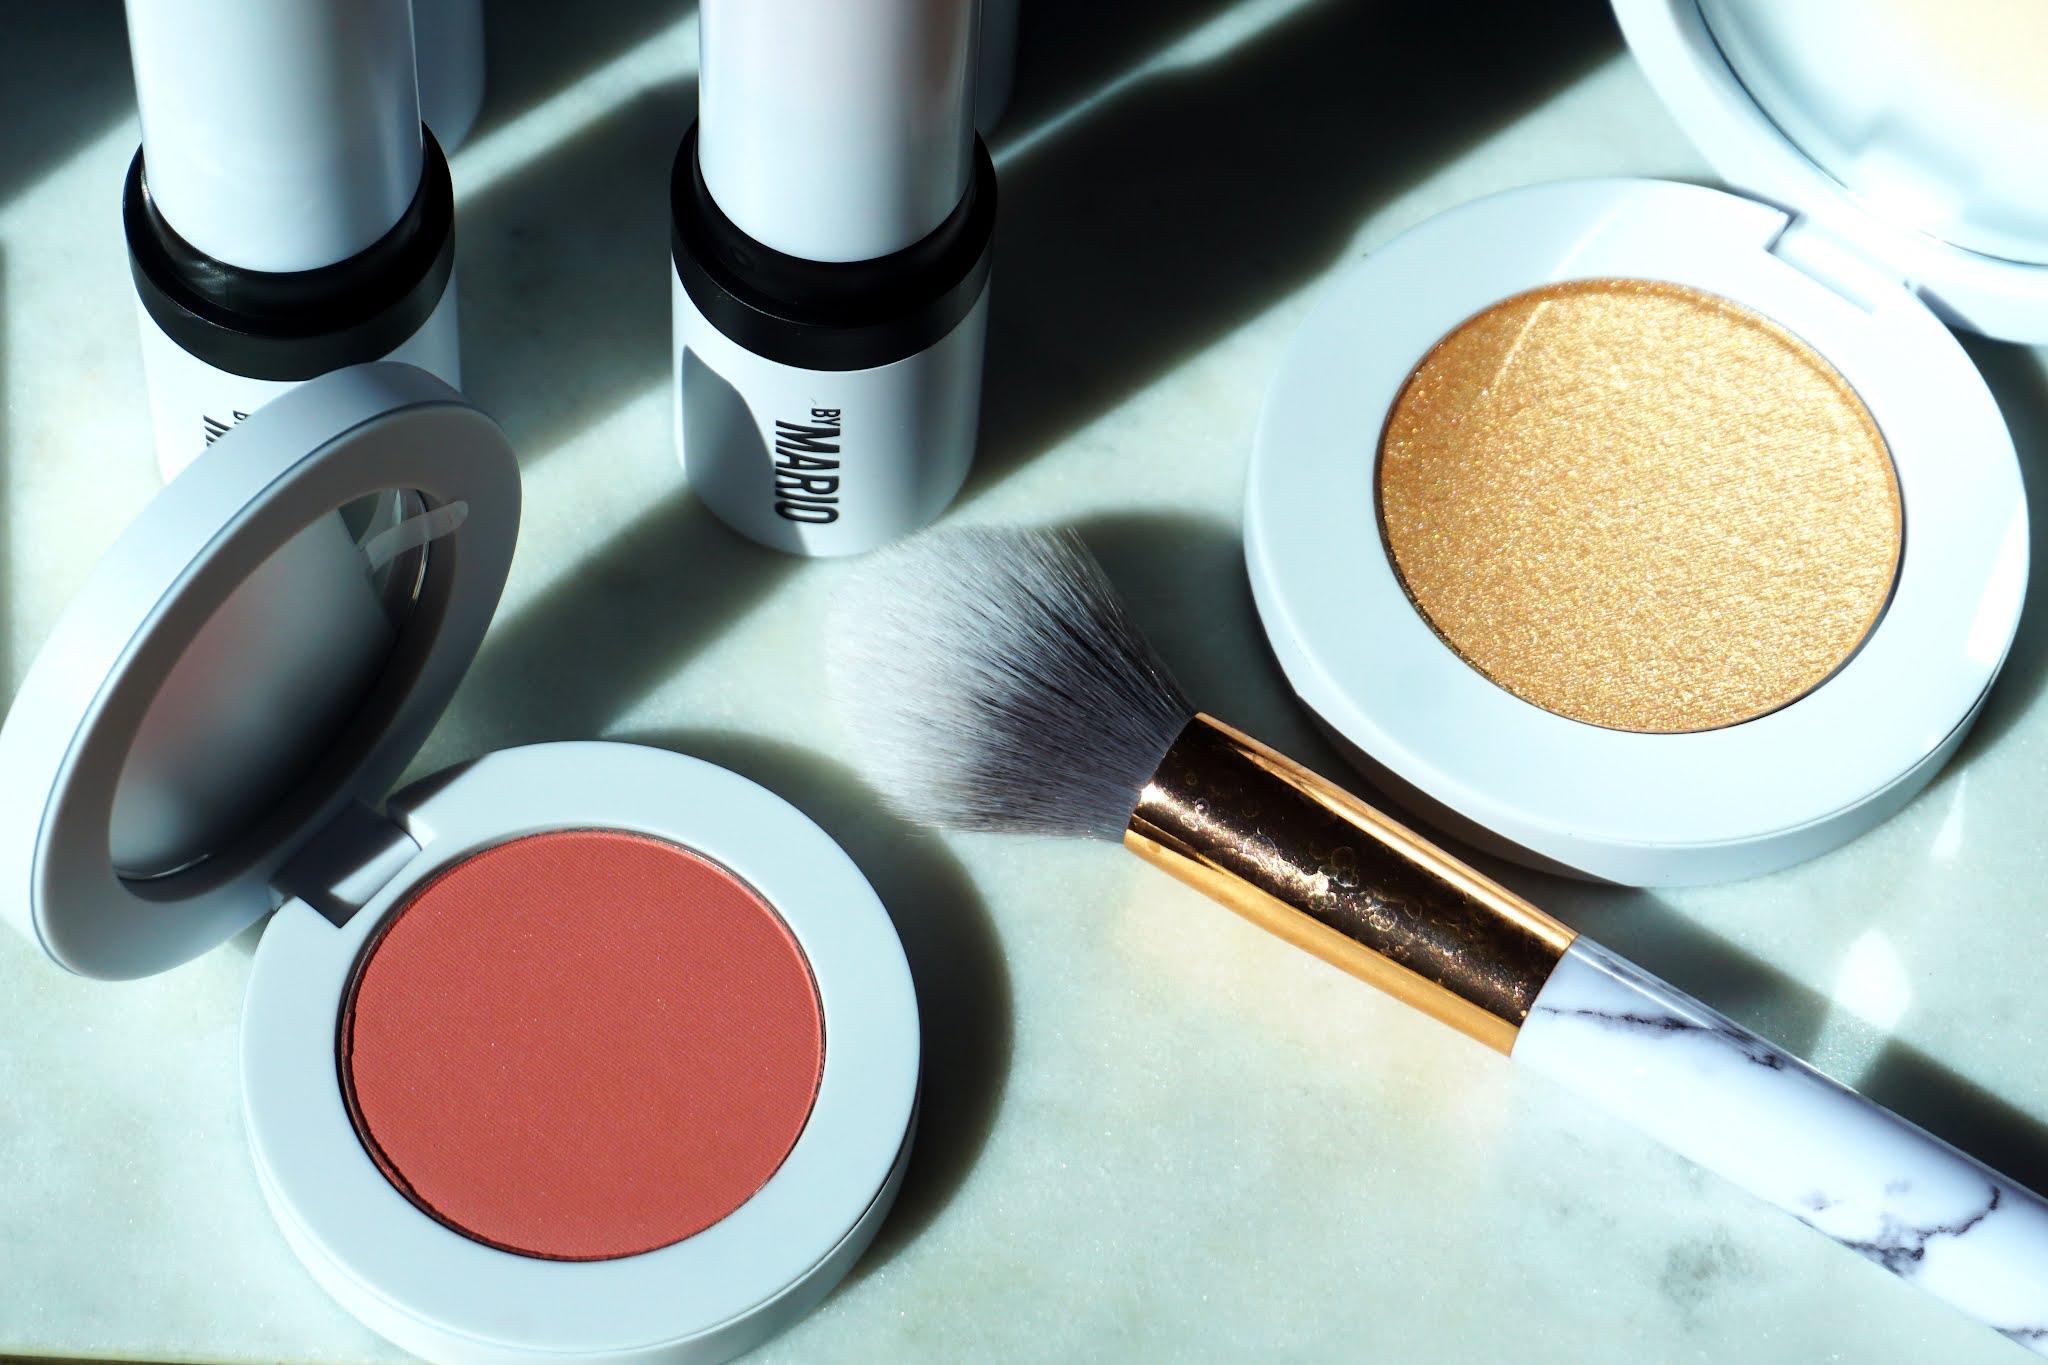 Makeup by Mario Blush & Highlighter